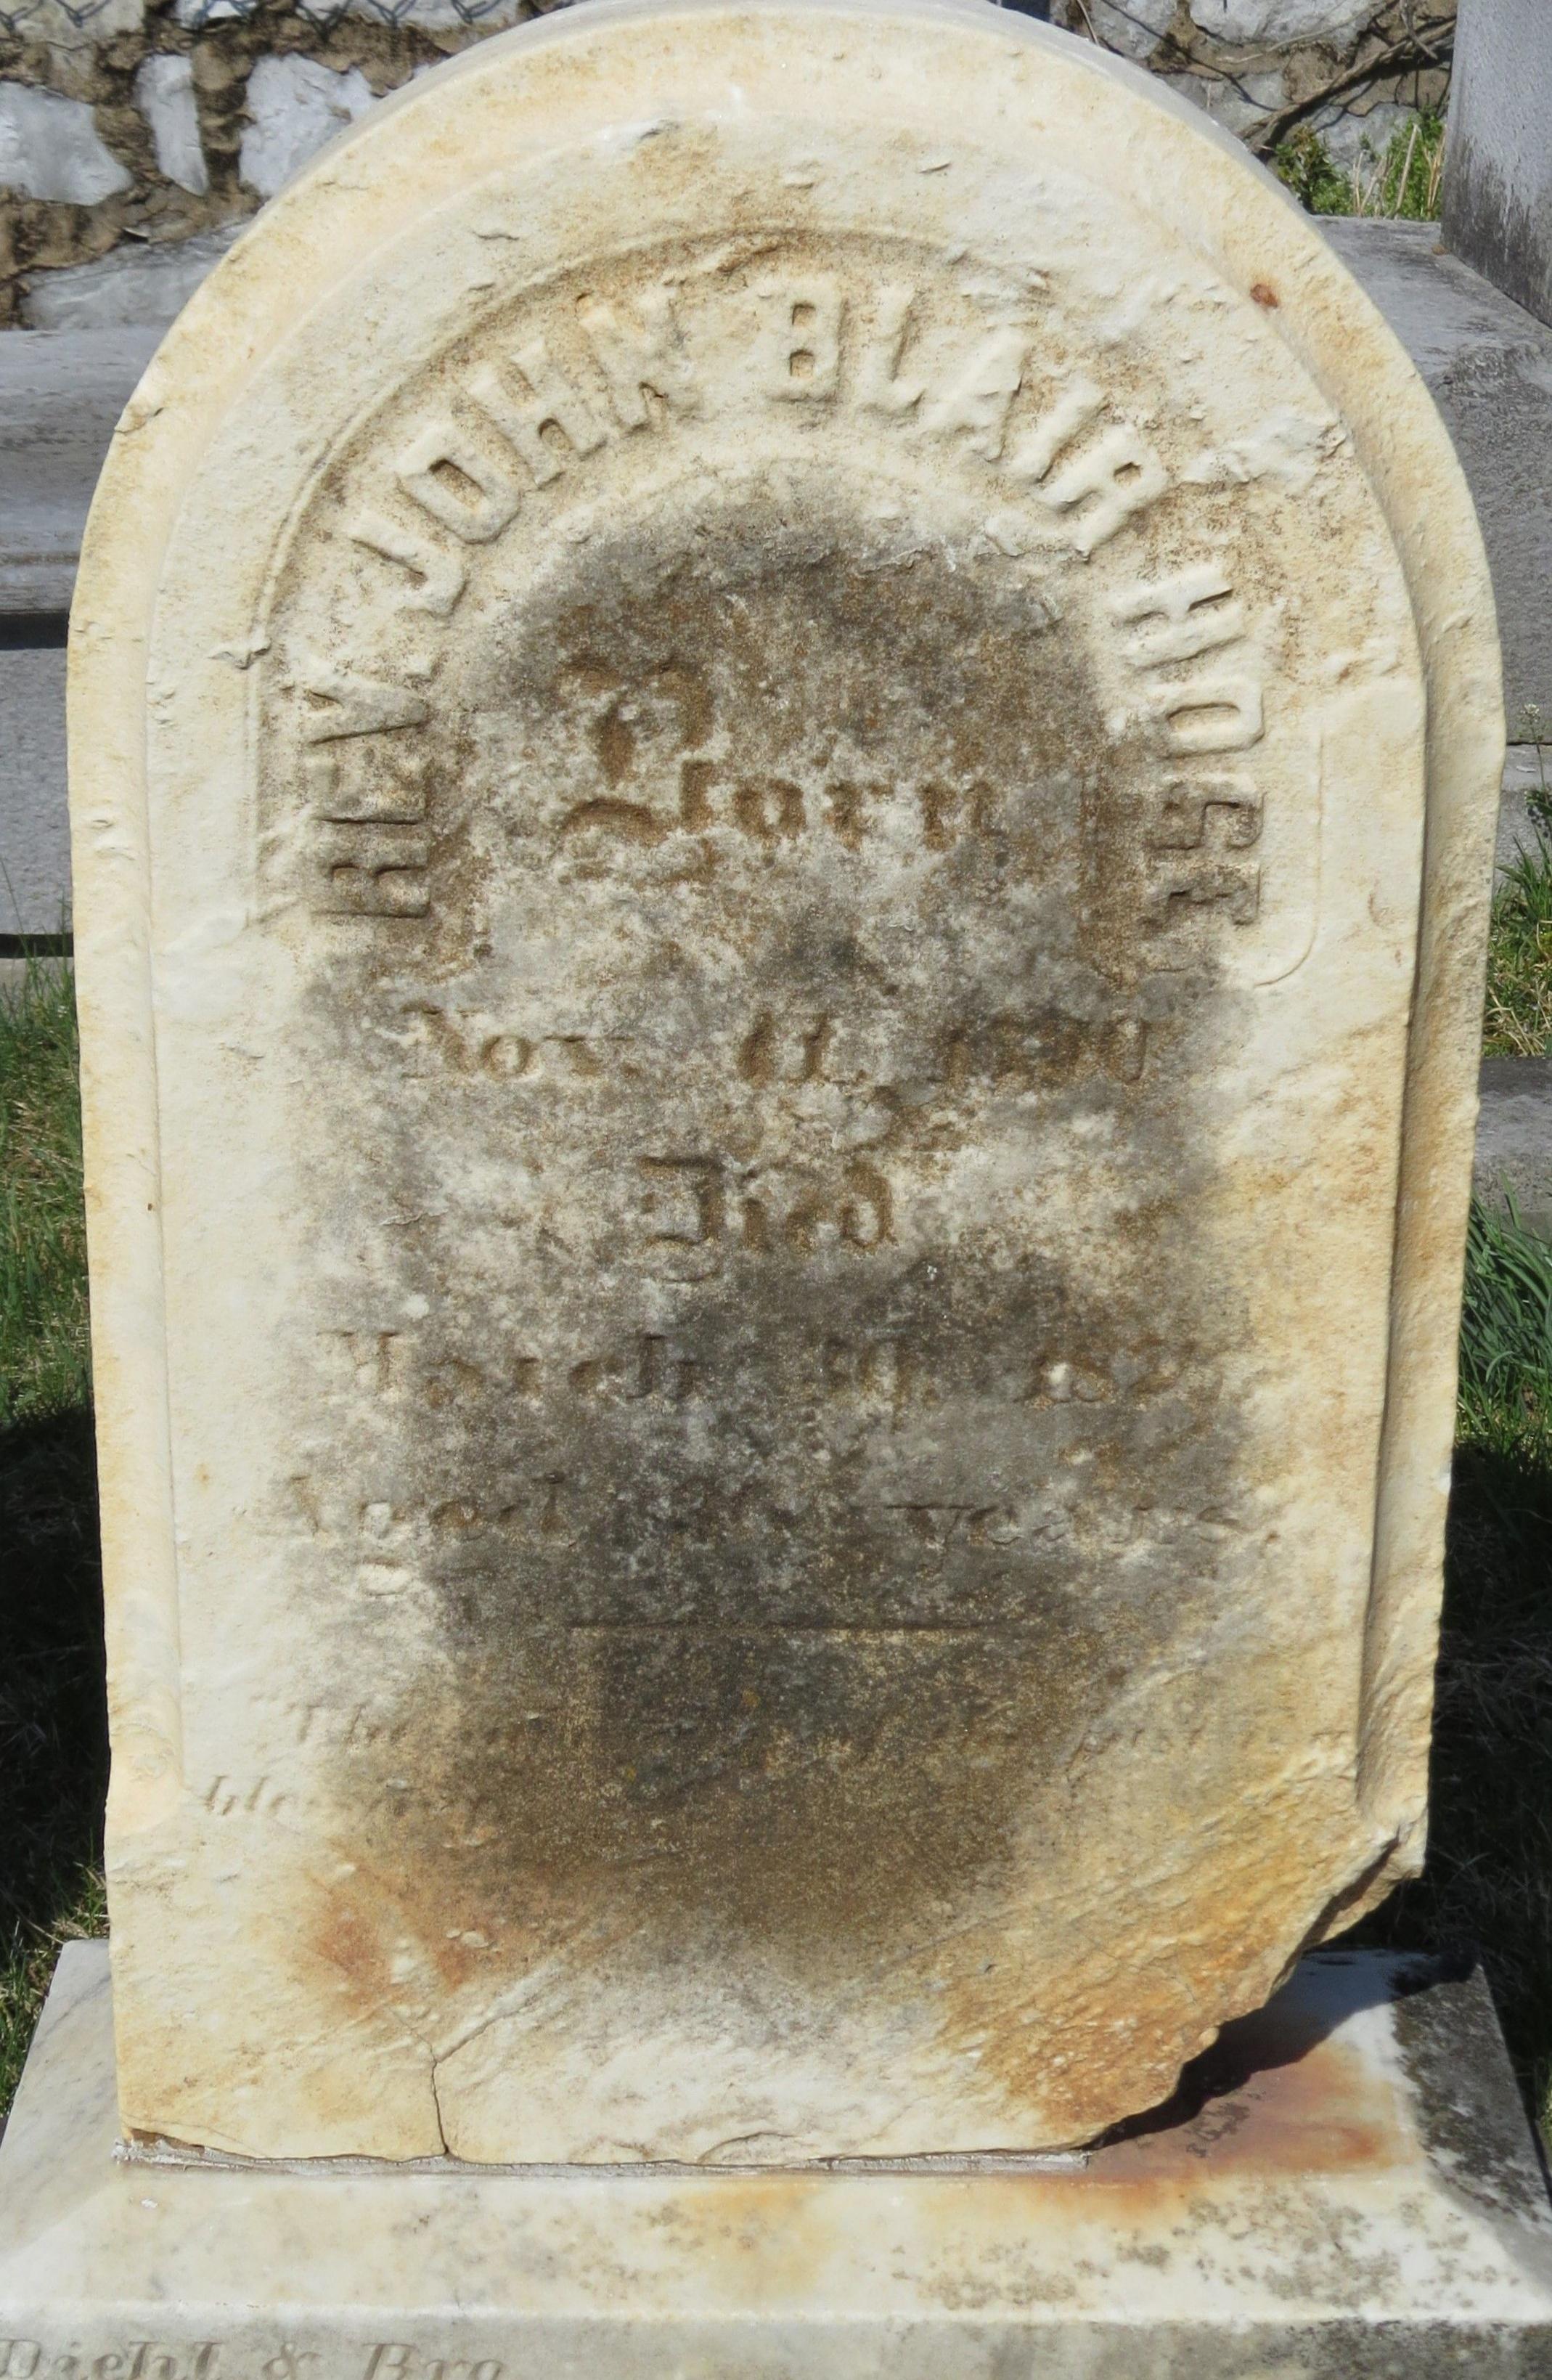 John Blair Hoge, Sr. is buried at Norbourne Parish Cemetery, Martinsburg, West Virginia.